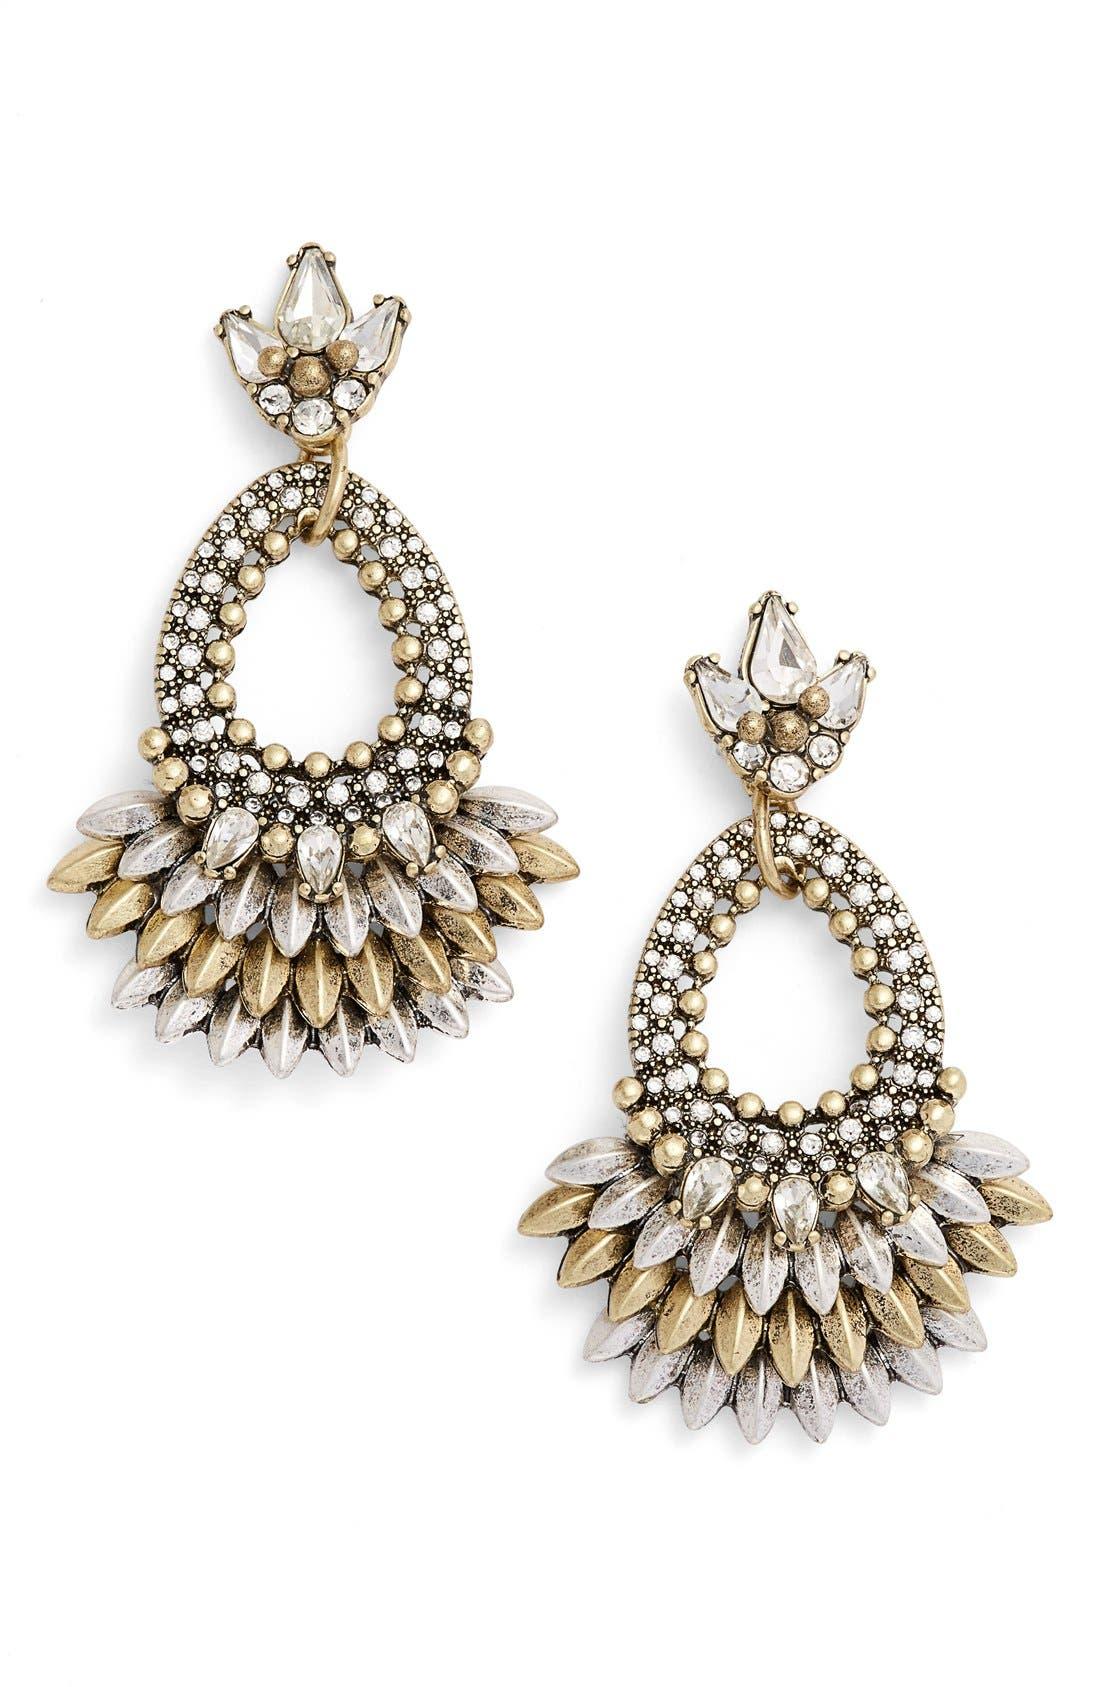 Tille Crystal Drop Earrings,                         Main,                         color, Antique Gold